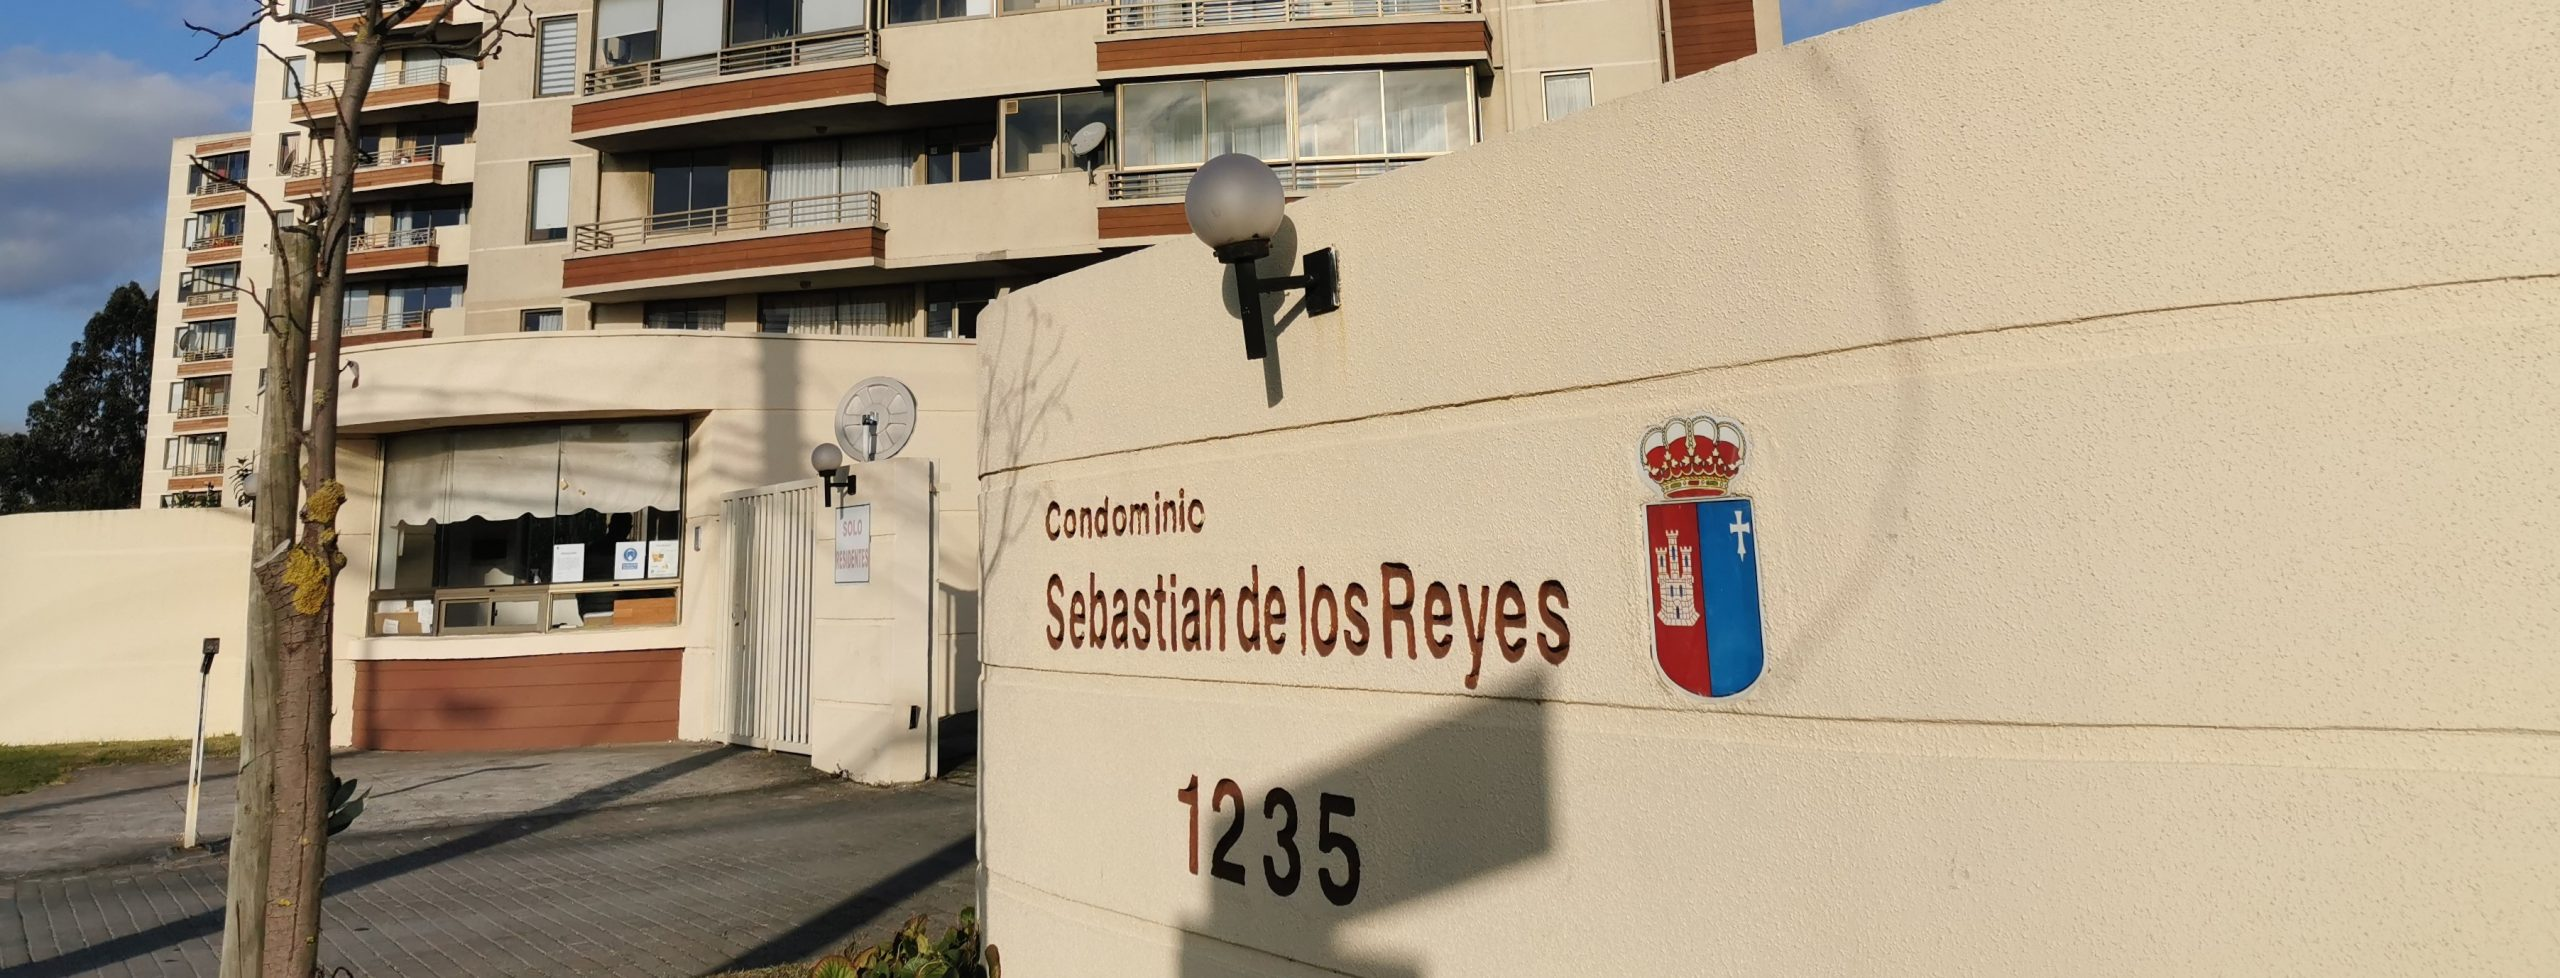 Vende departamento Huertos Familiares San Pedro de la Paz.